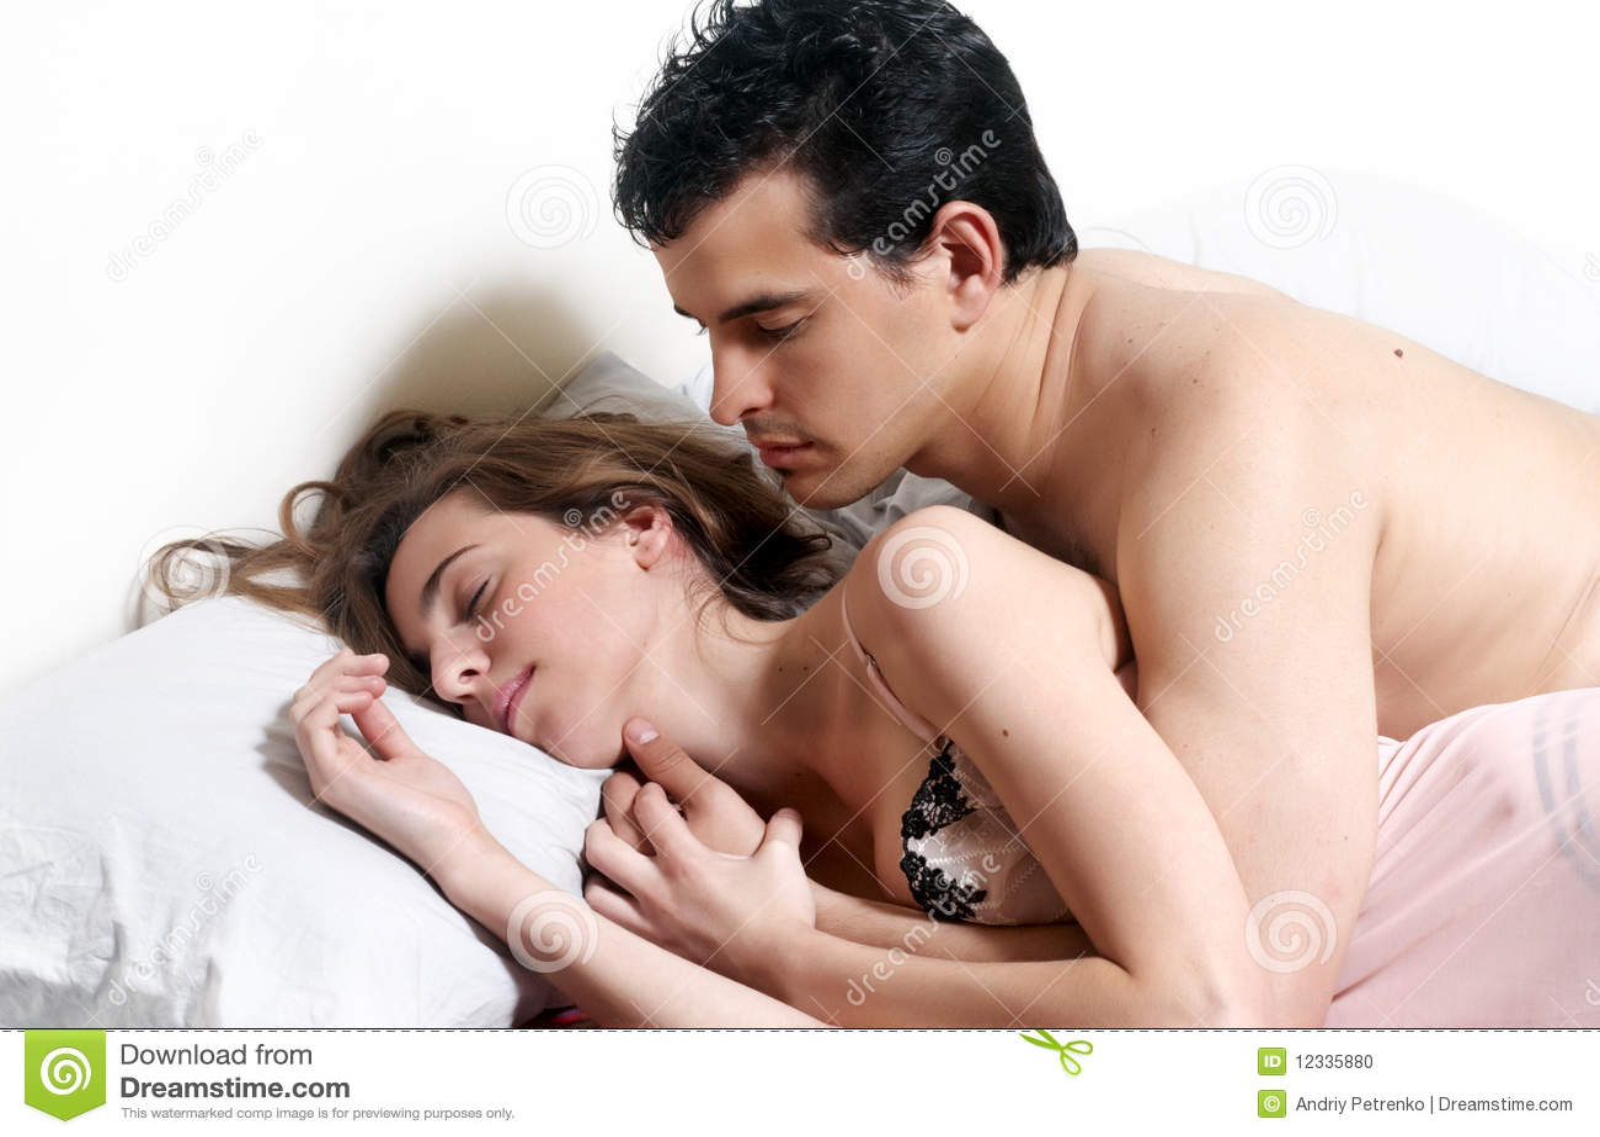 Як можна займатися сексом фото 24 фотография